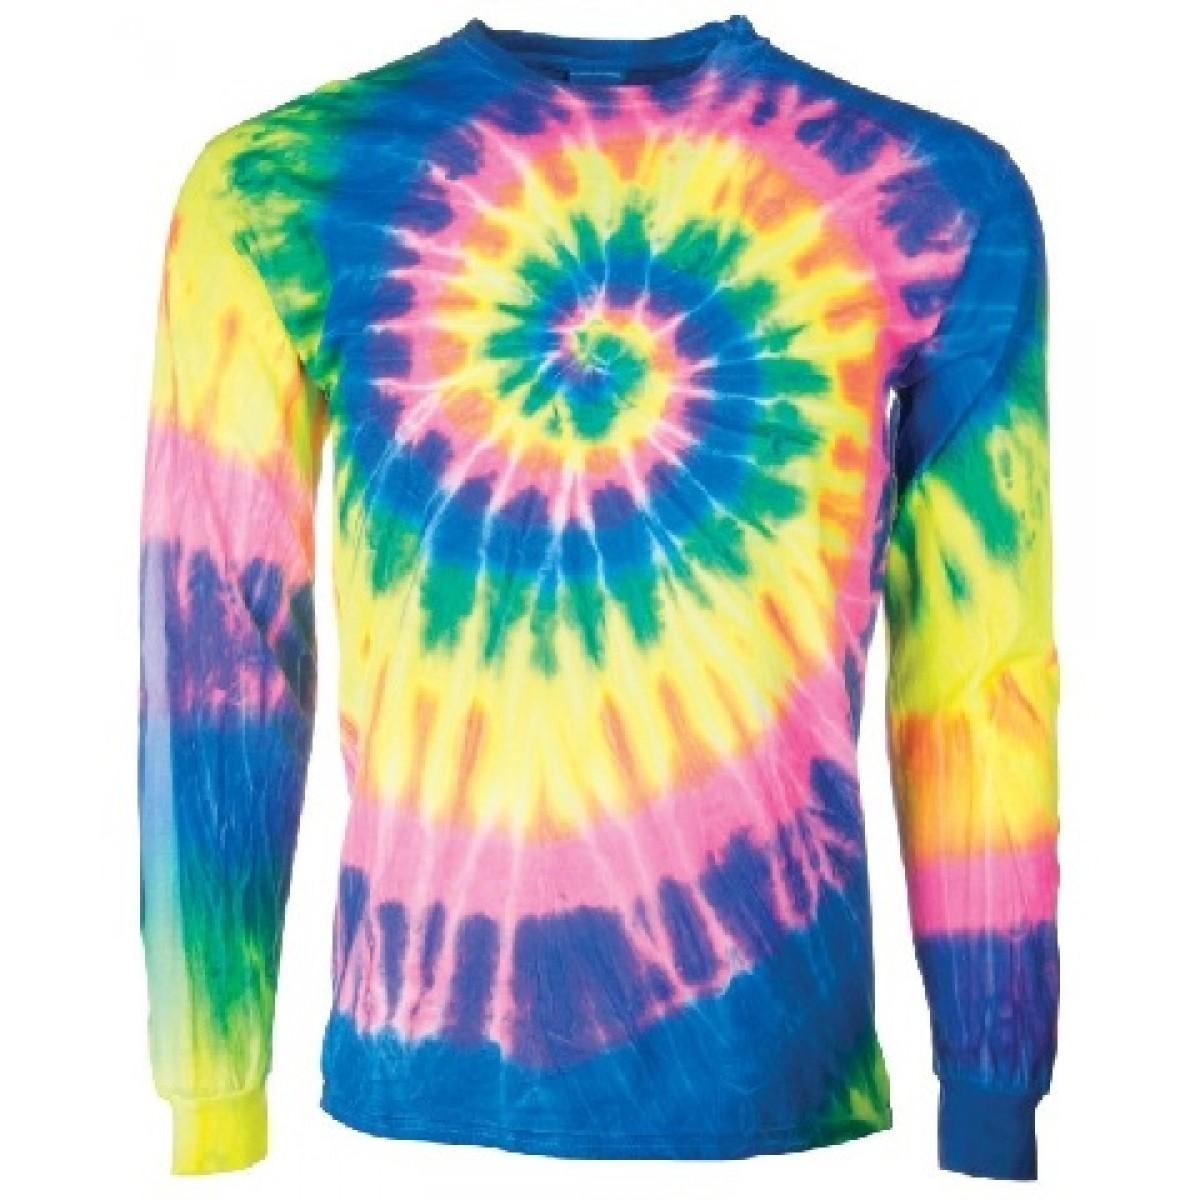 Spiral Tie Dye Long Sleeve Flo Rainbow-Rainbow-L